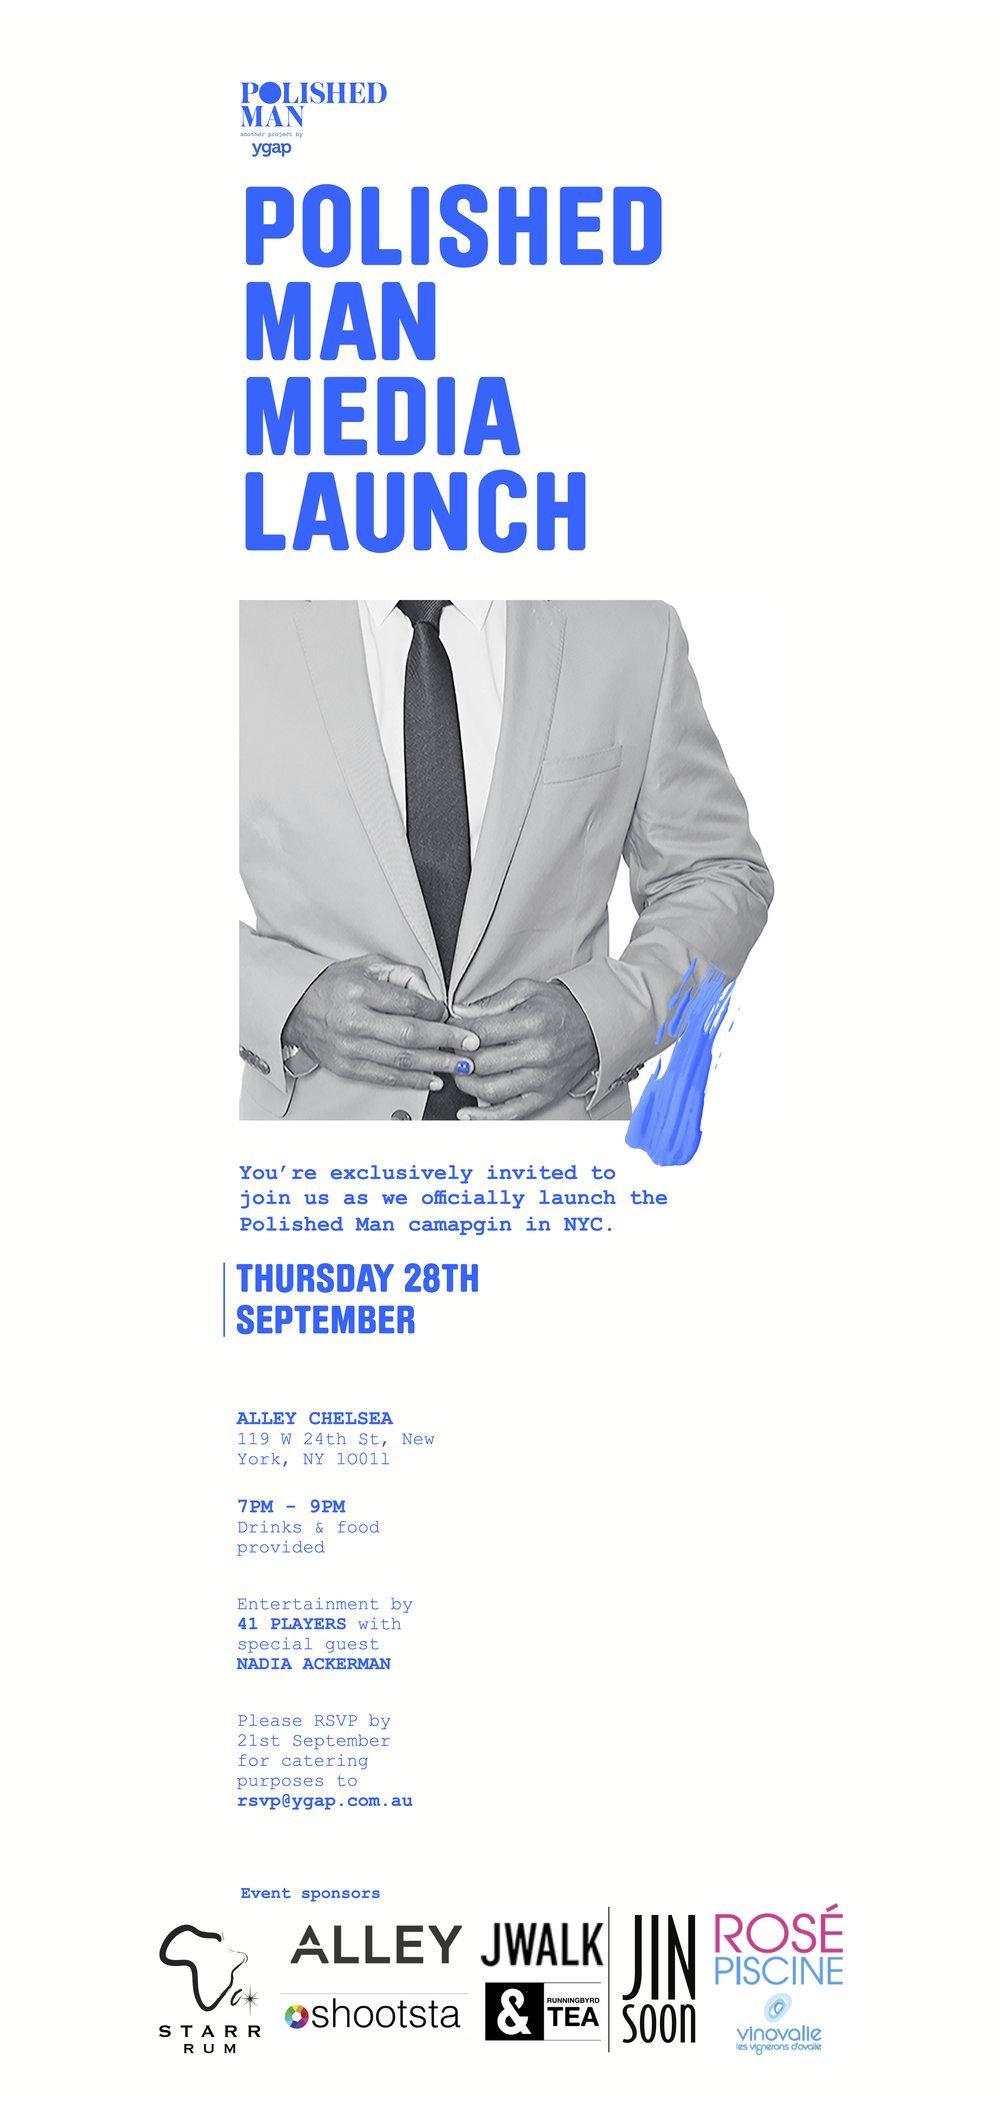 Polished Man Media Launch Invite (1).jpg